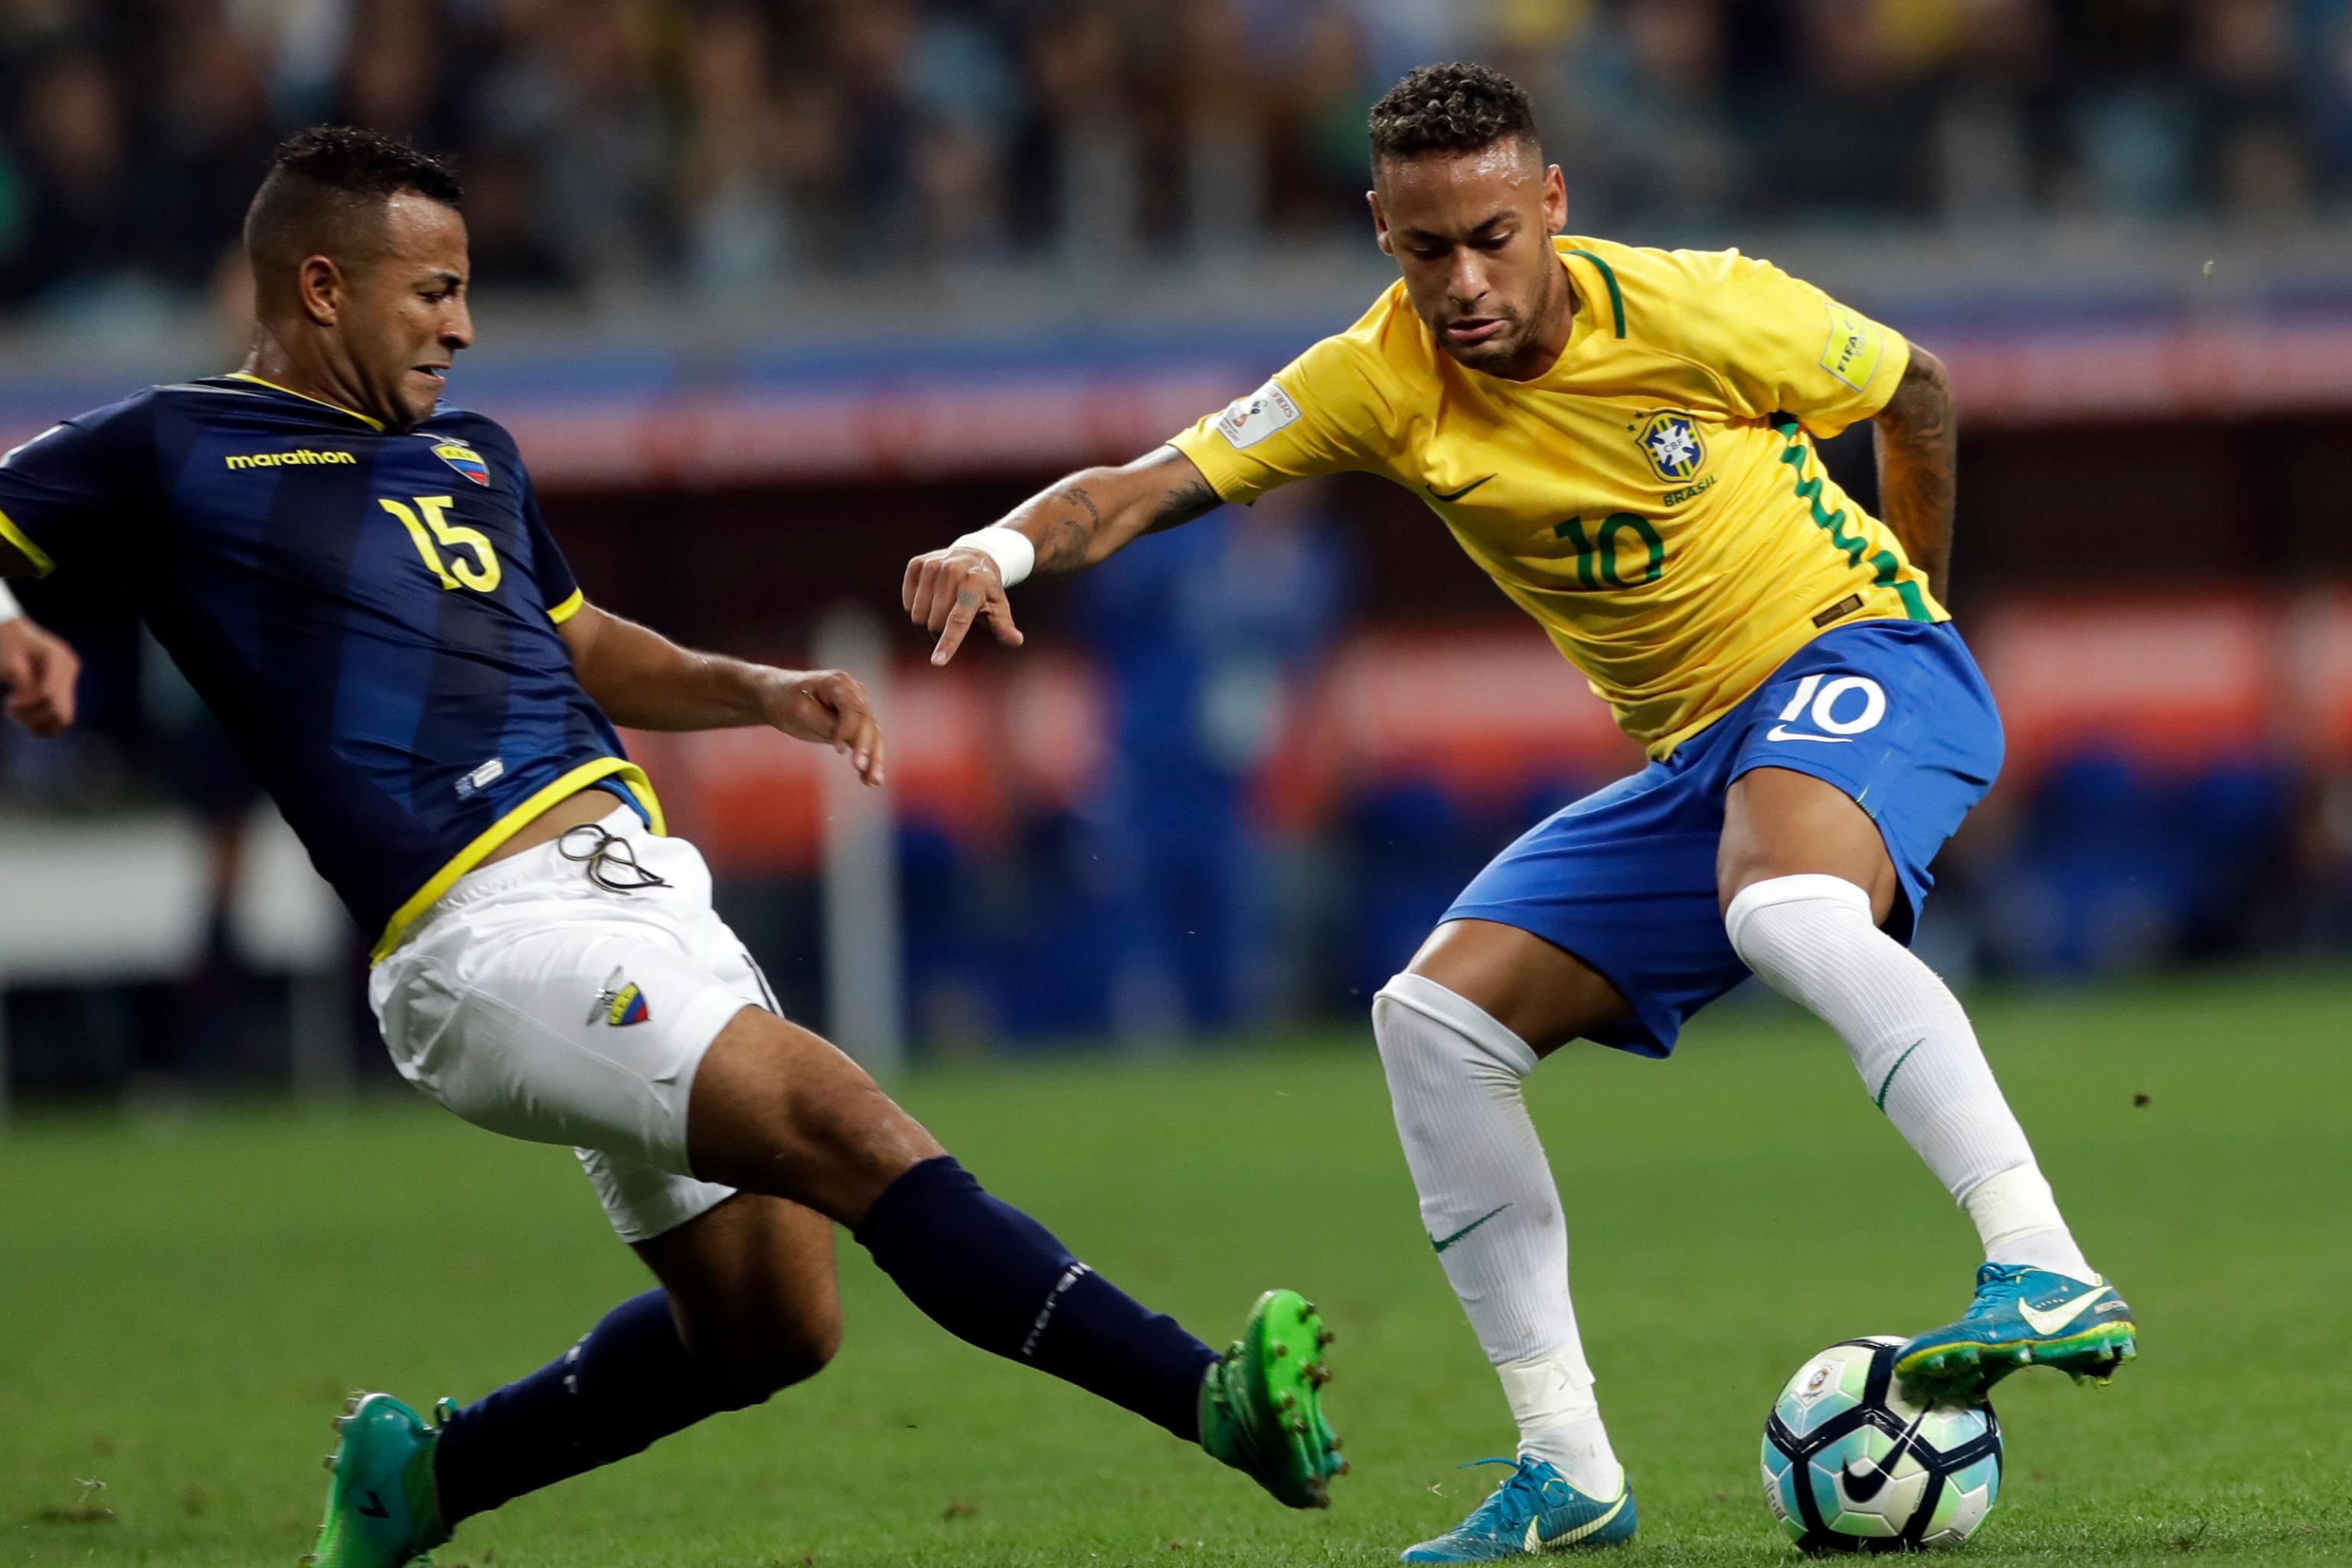 Brazil spain betting preview uk horse racing betting rules on blackjack